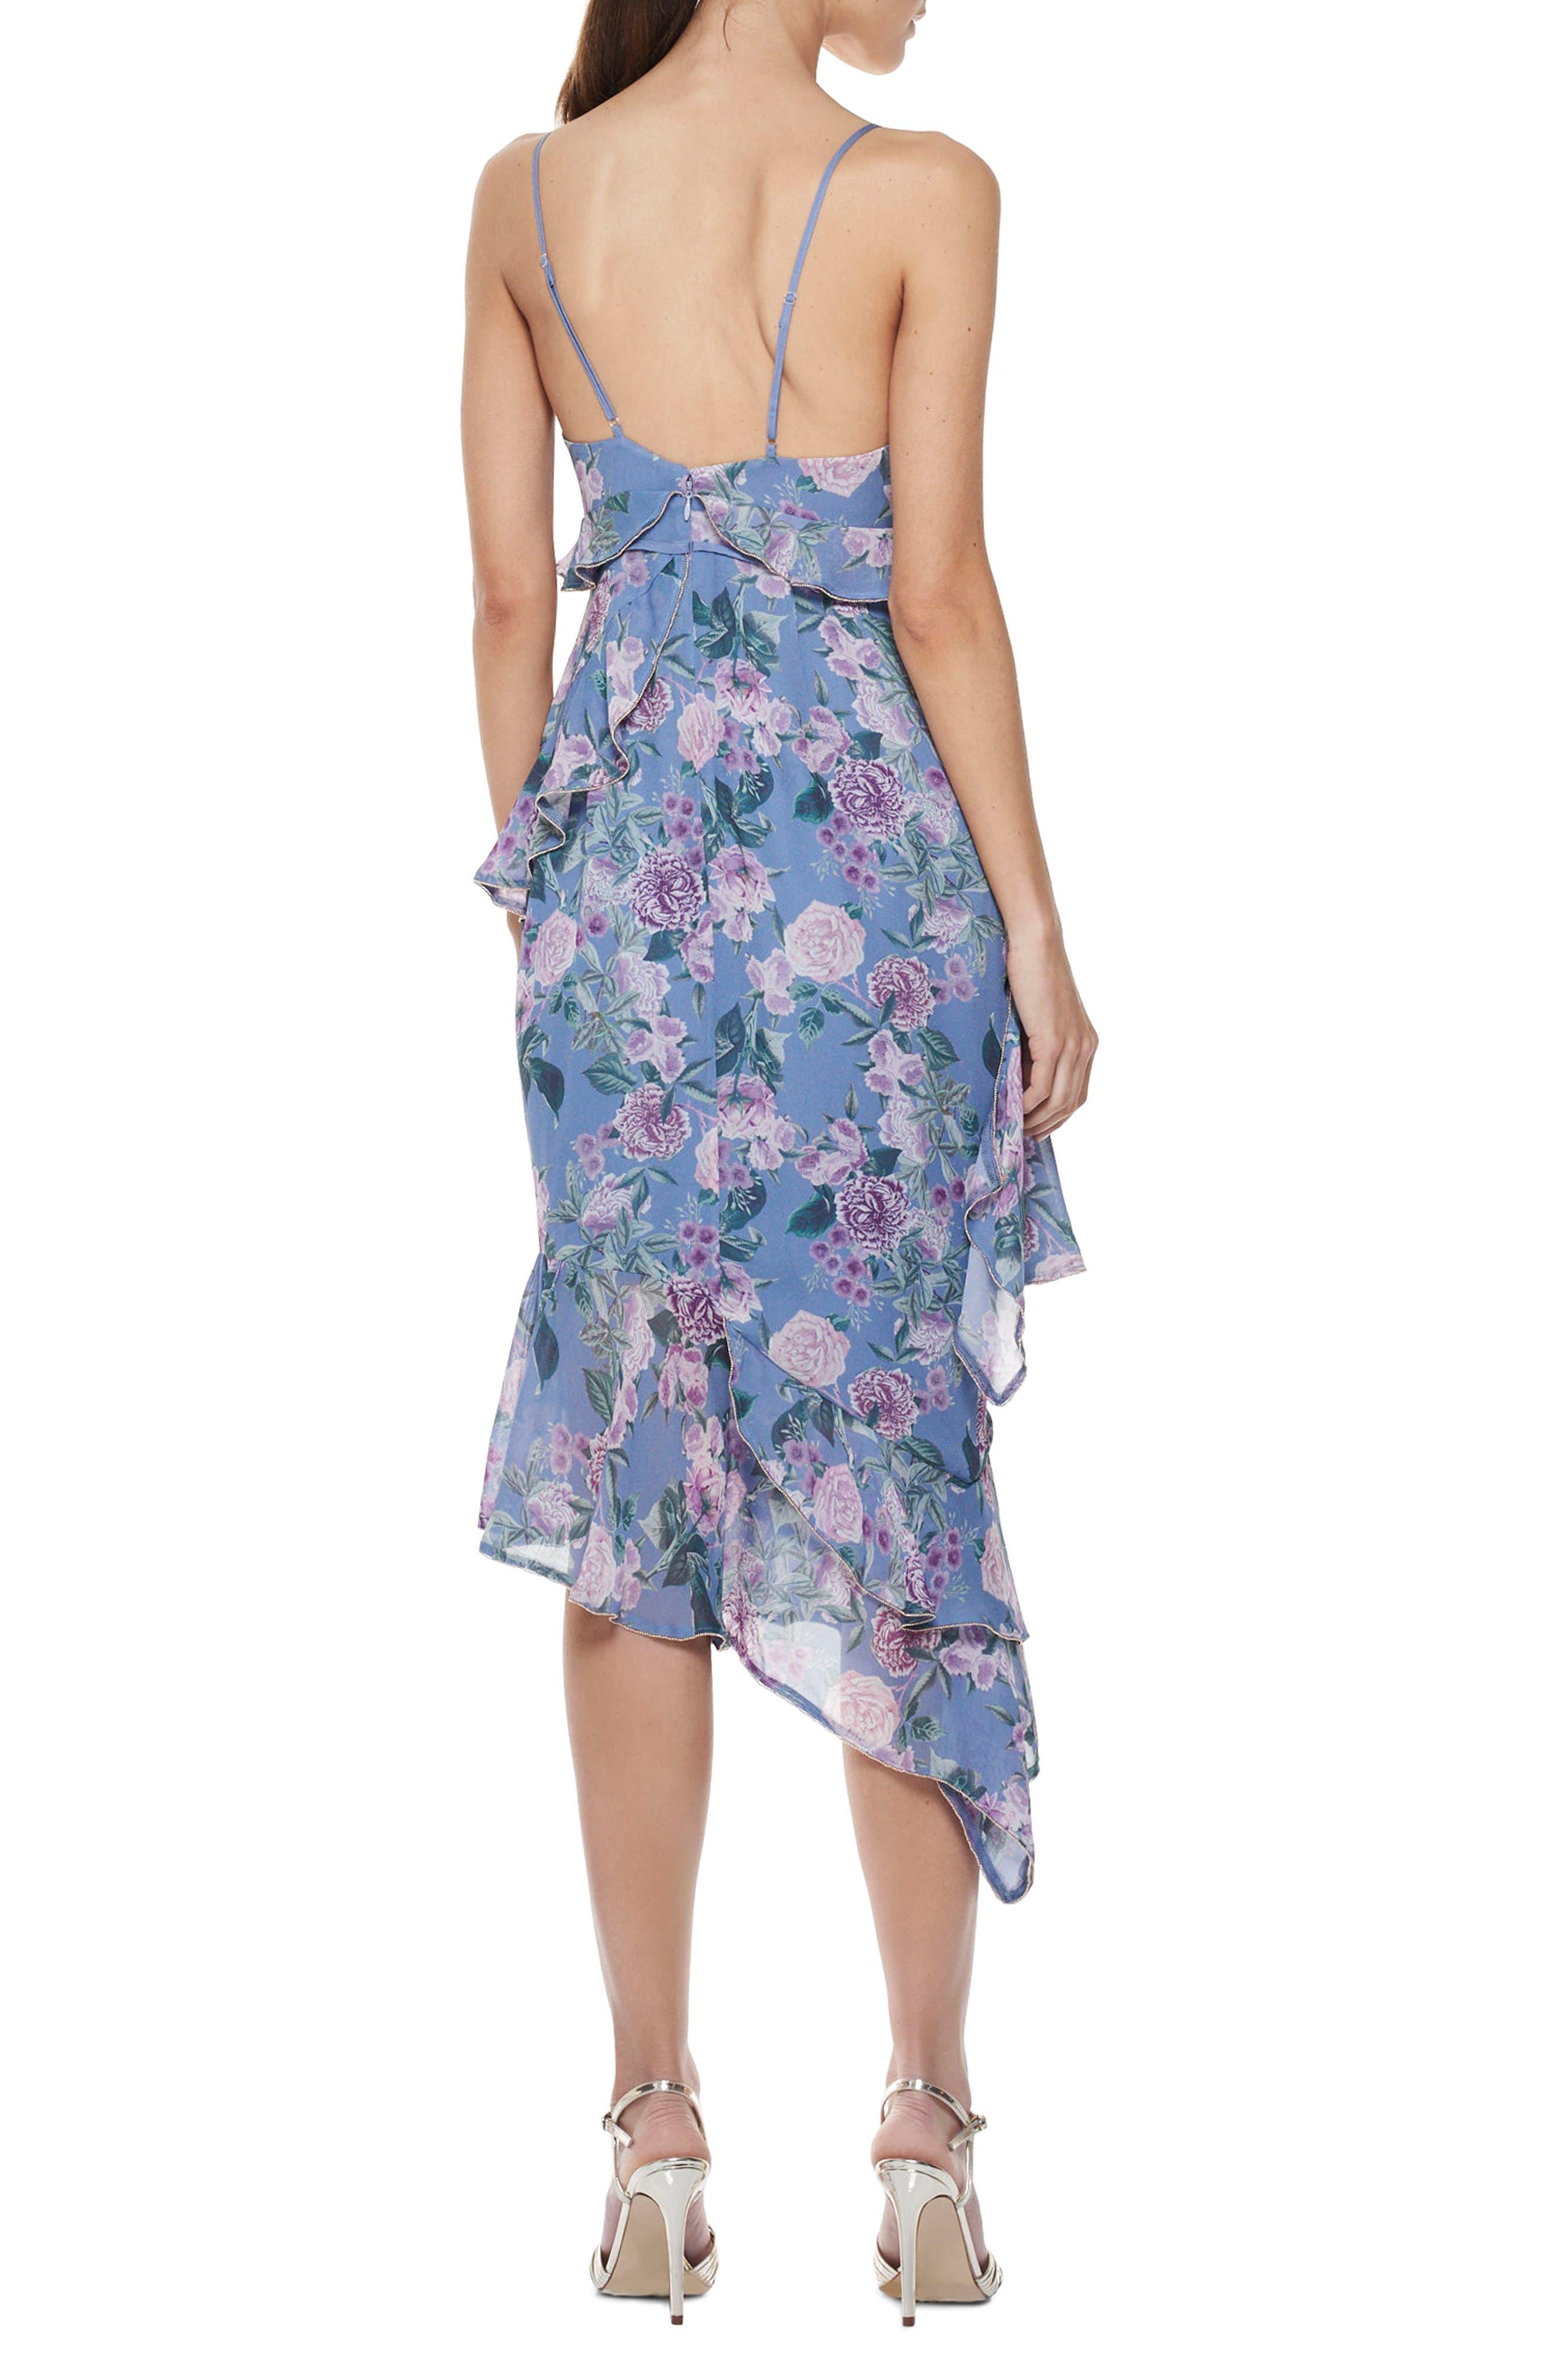 Here & Now Asymmetric Midi Dress,                             Alternate thumbnail 2, color,                             400